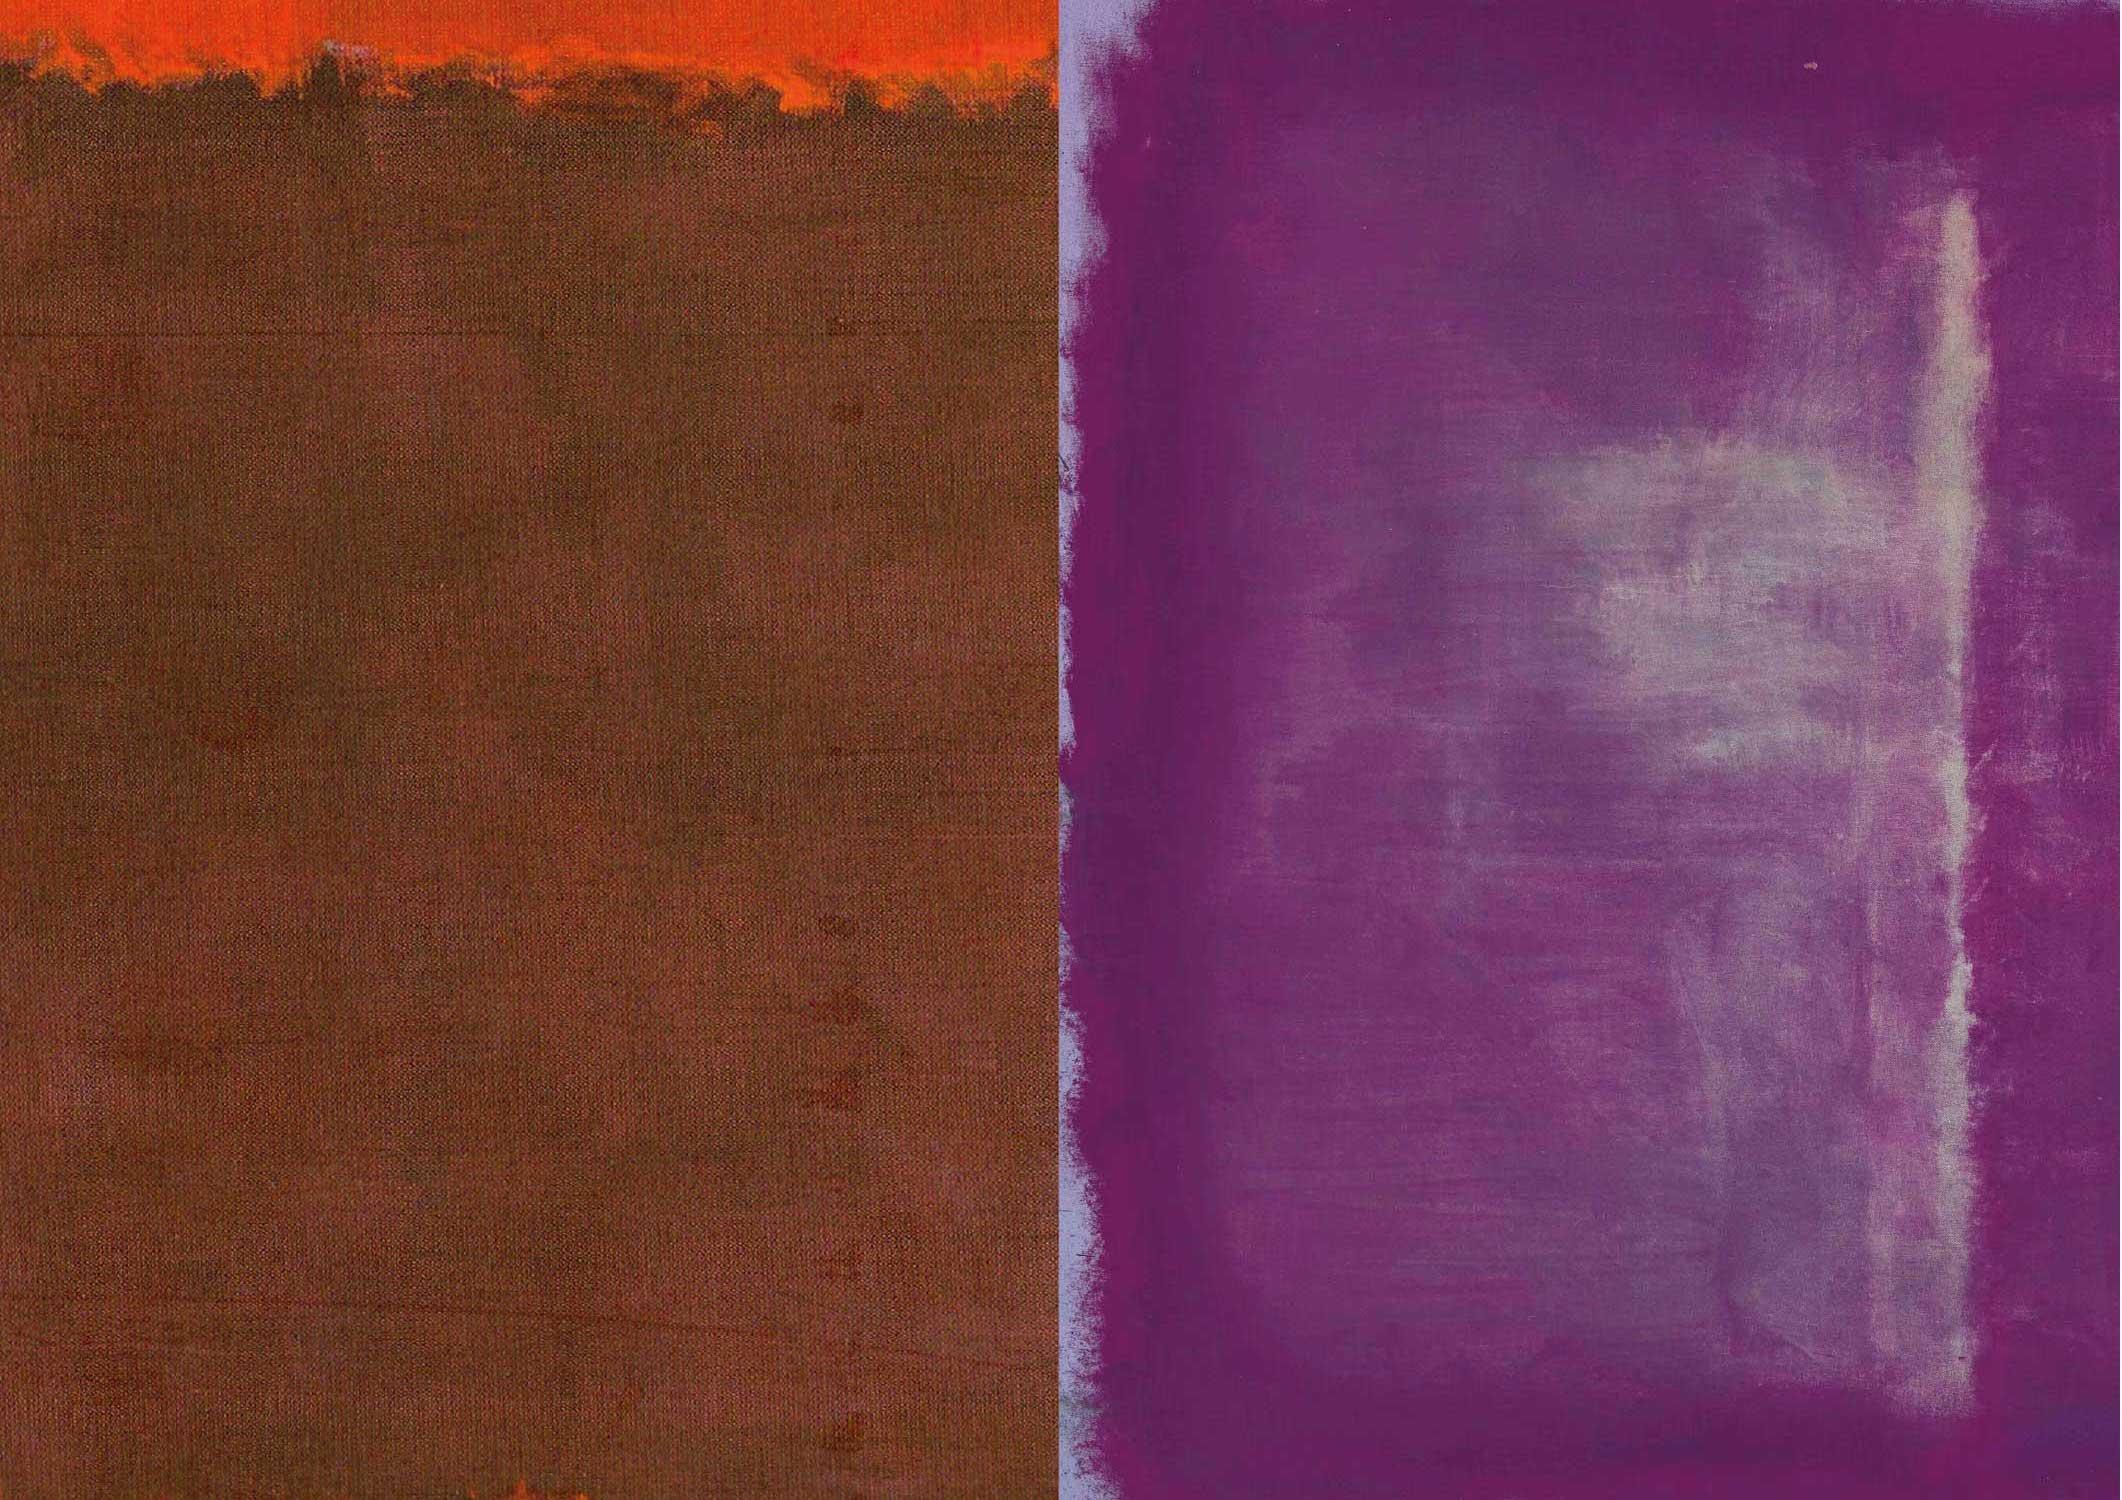 Best_Optyk_Rothko-Brown-and-Purple.jpg